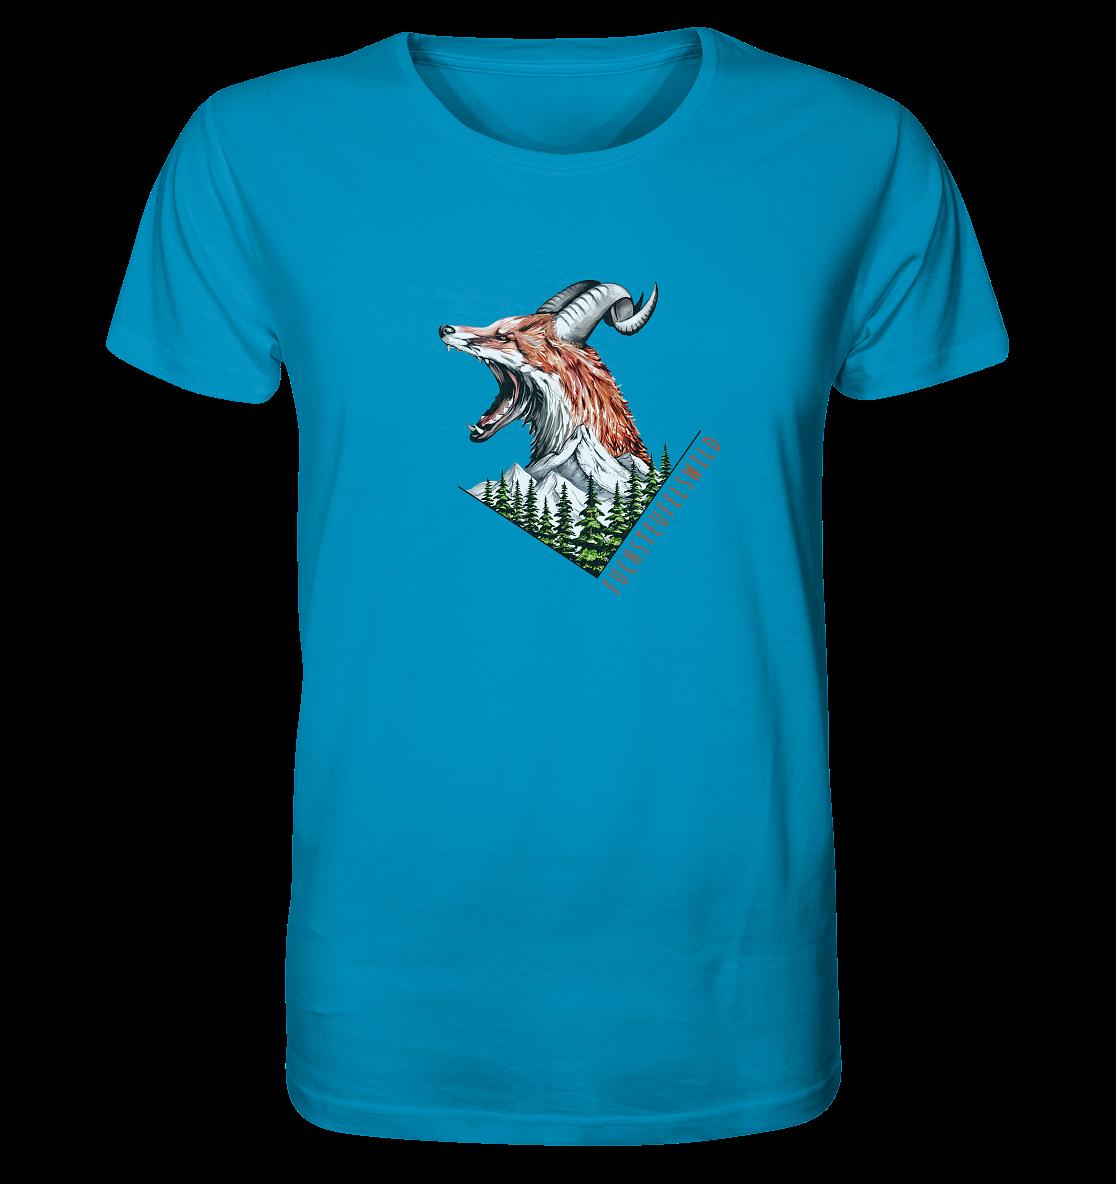 front-organic-shirt-0092c0-1116x-1.png